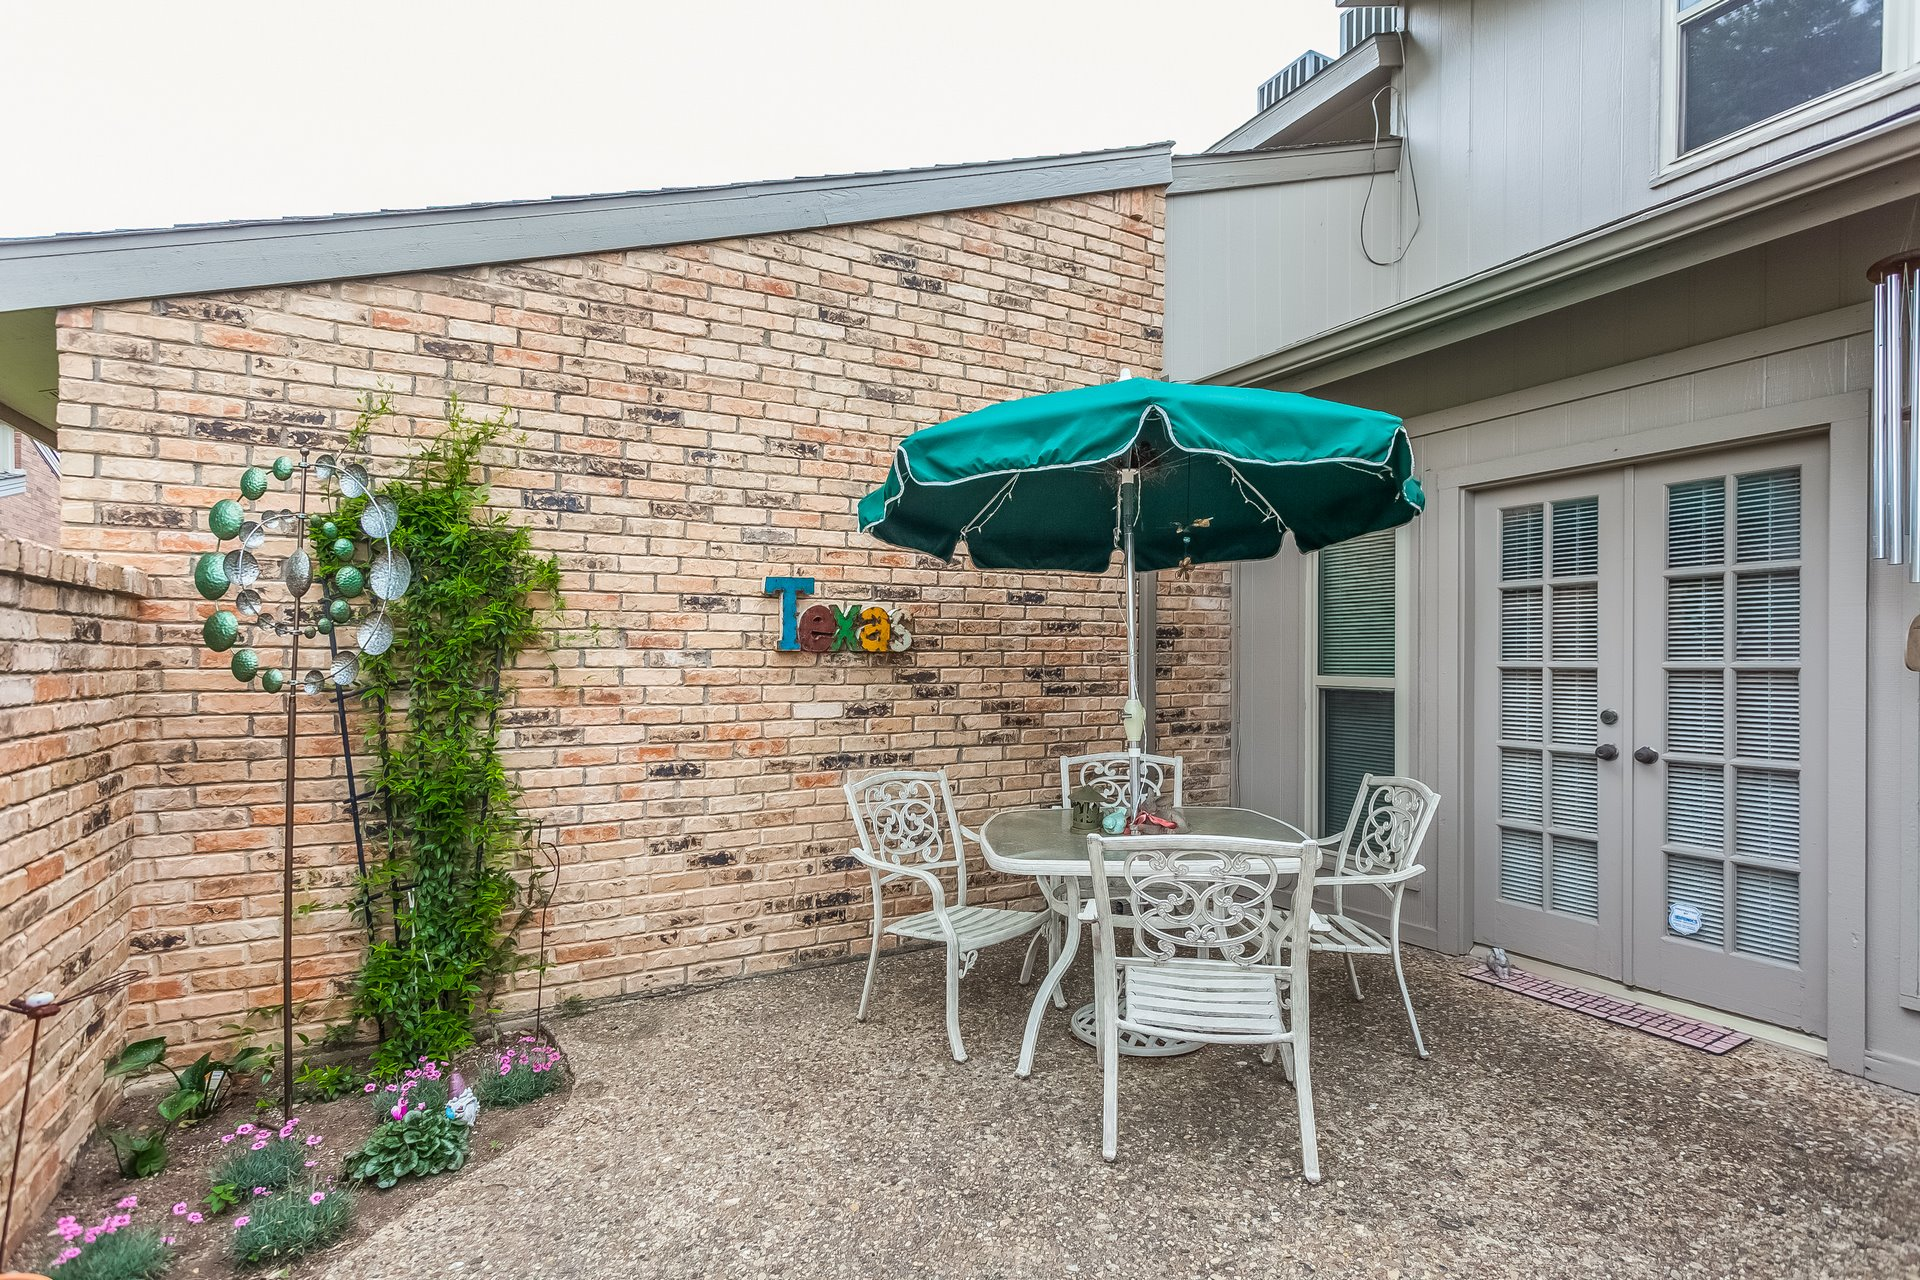 24 - 12598 Montego Plaza, Dallas TX 75230 Robert Jory Group.jpg